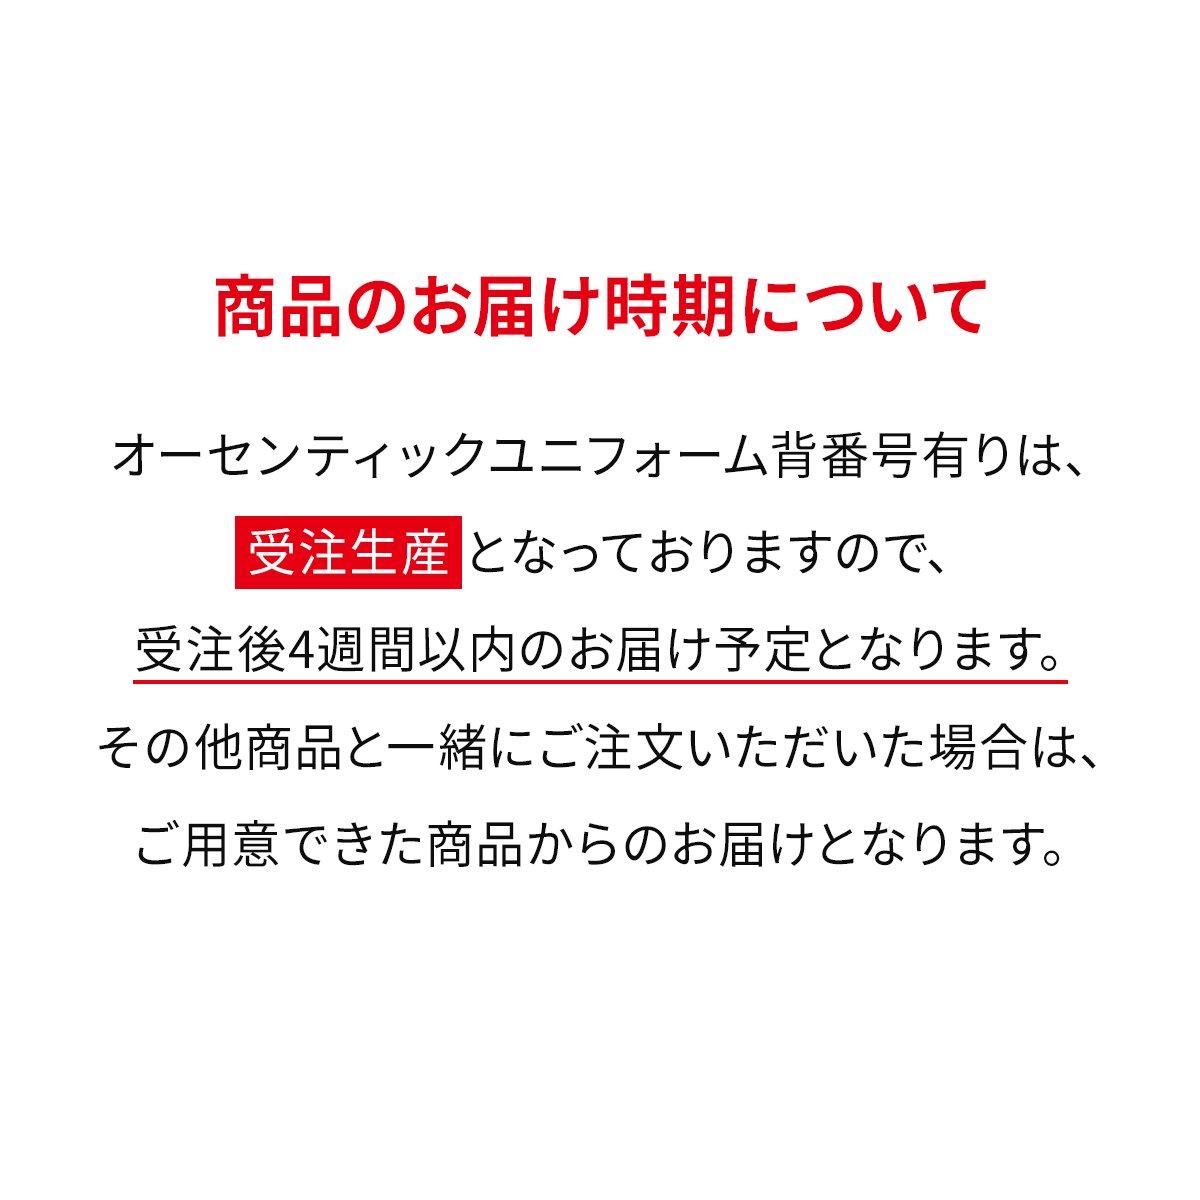 <img class='new_mark_img1' src='https://img.shop-pro.jp/img/new/icons8.gif' style='border:none;display:inline;margin:0px;padding:0px;width:auto;' />沖縄SV(OSV) 2020 オーセンティックユニフォーム アウェイ